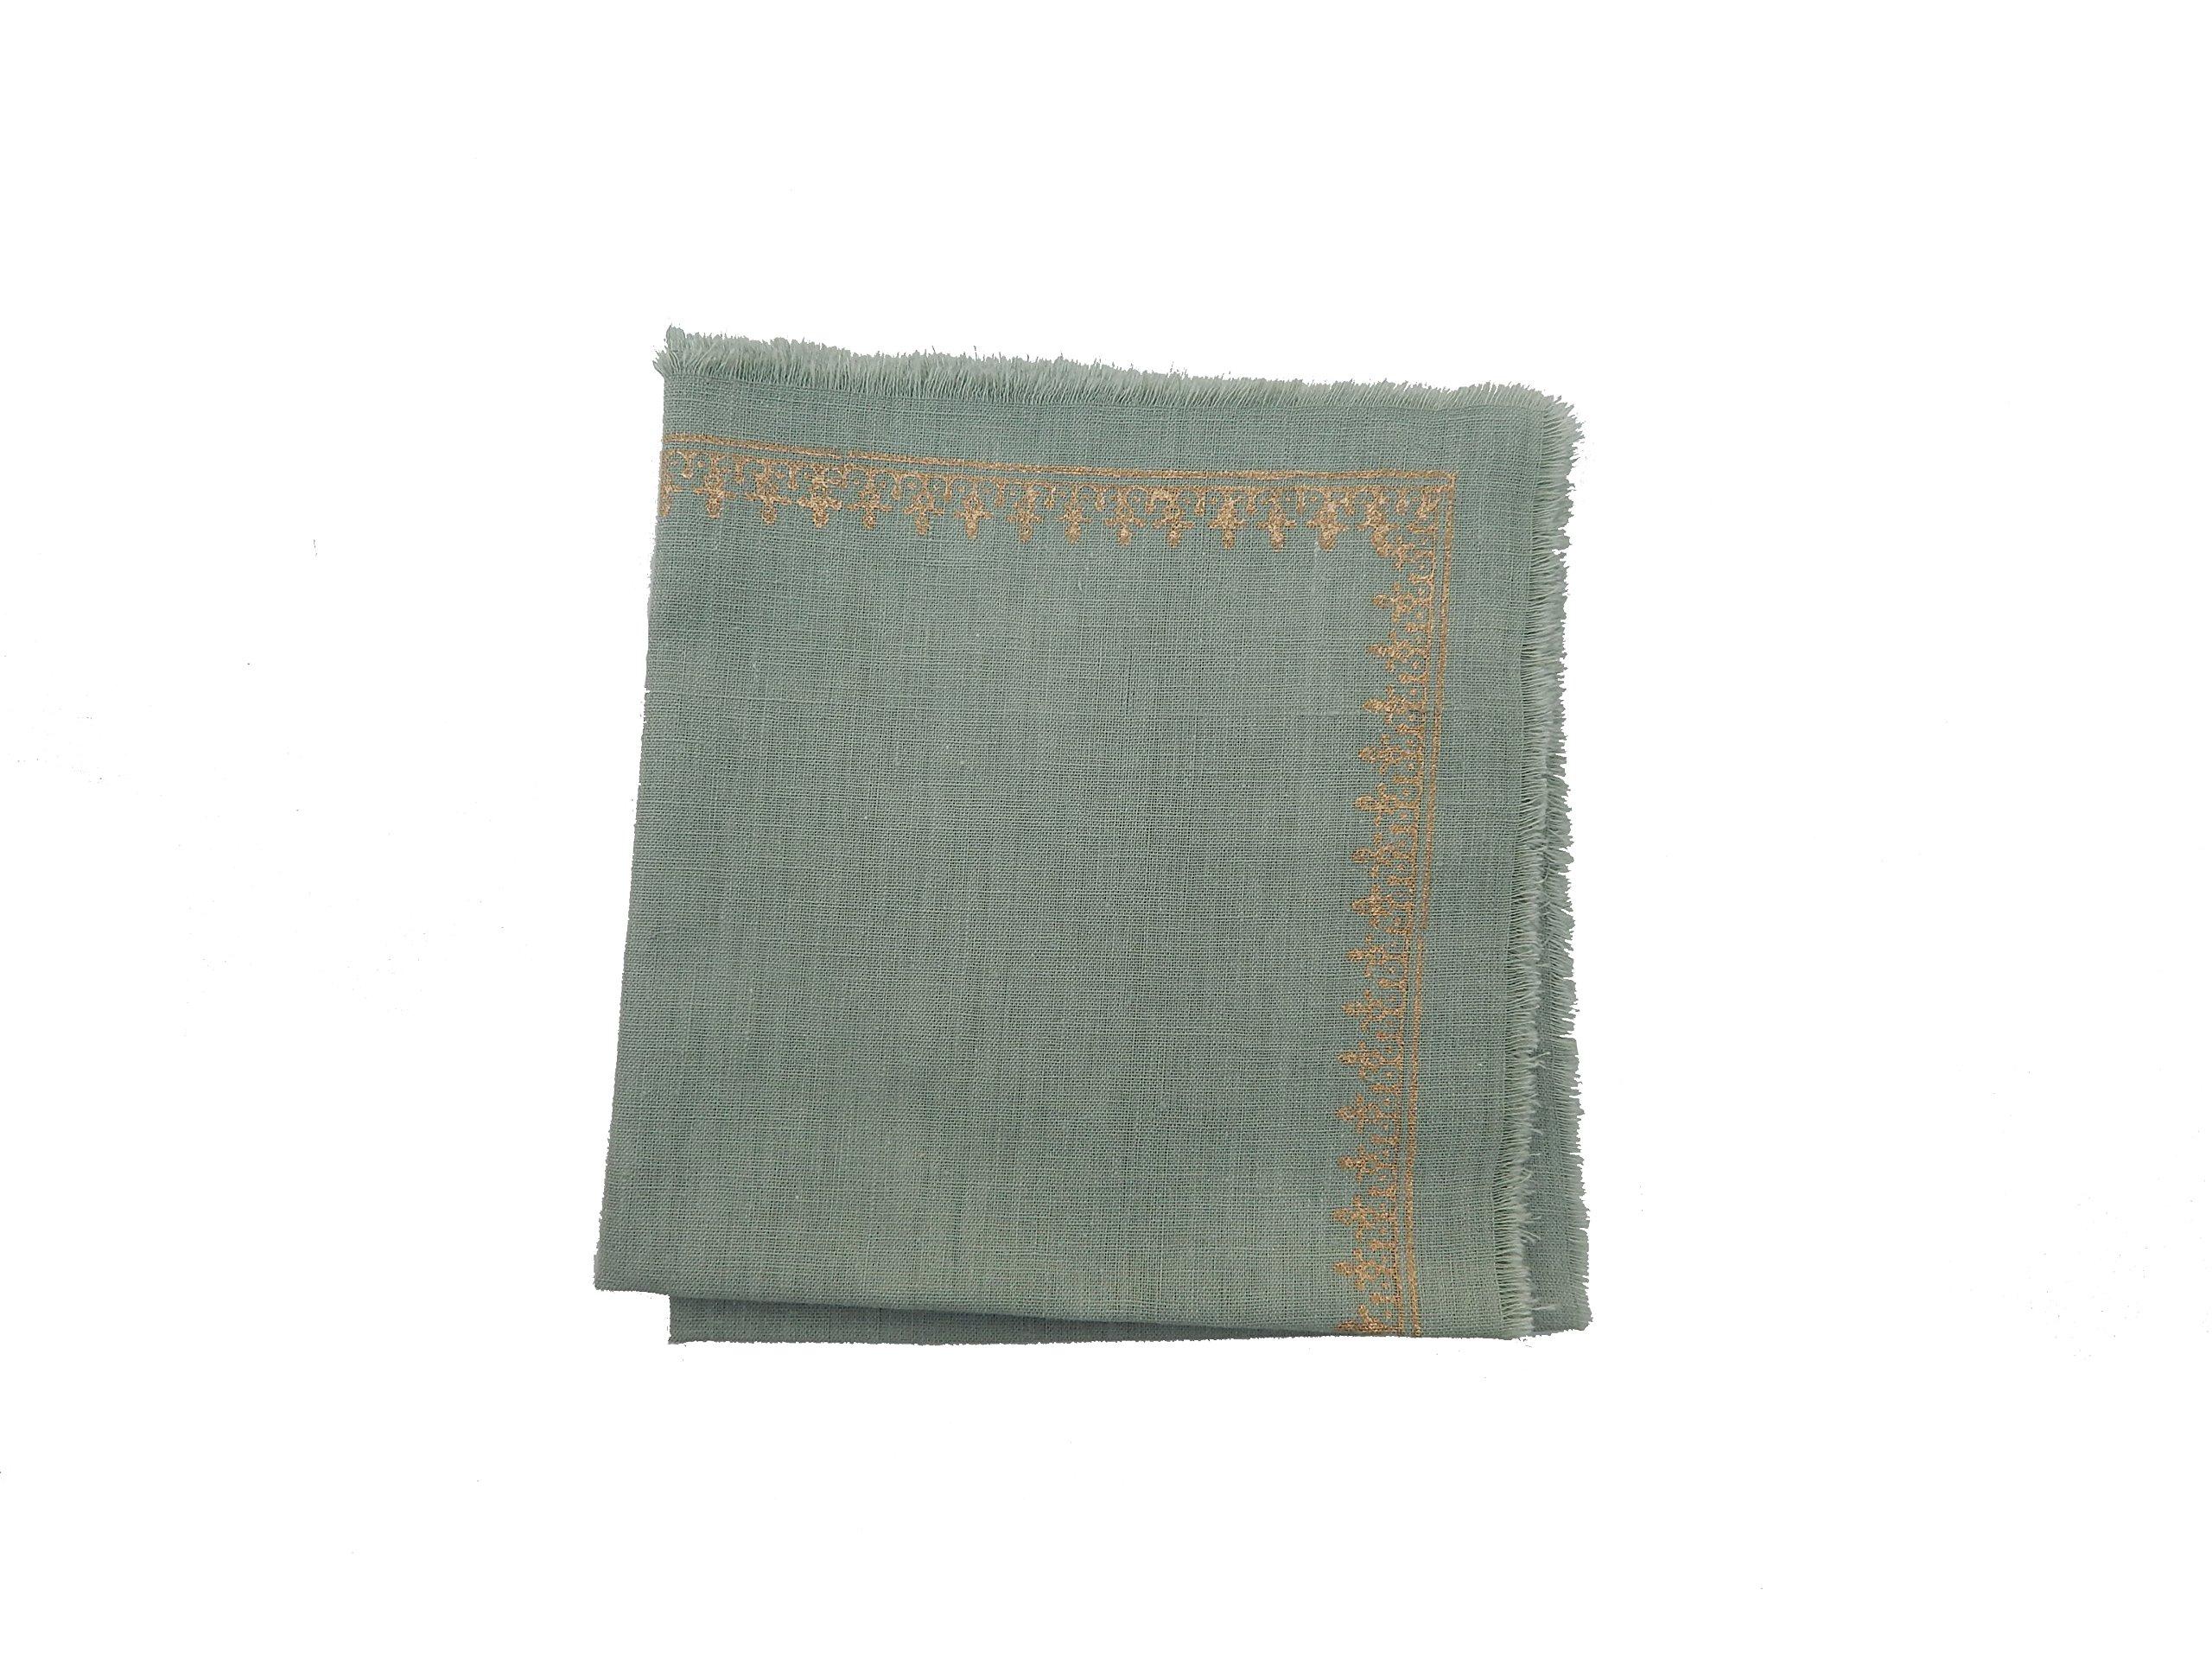 Gitika Goyal Home Cotton Khadi Gold Hand Block Printed 17x17 Napkin Small Kangura Design (Set of 4), Patina